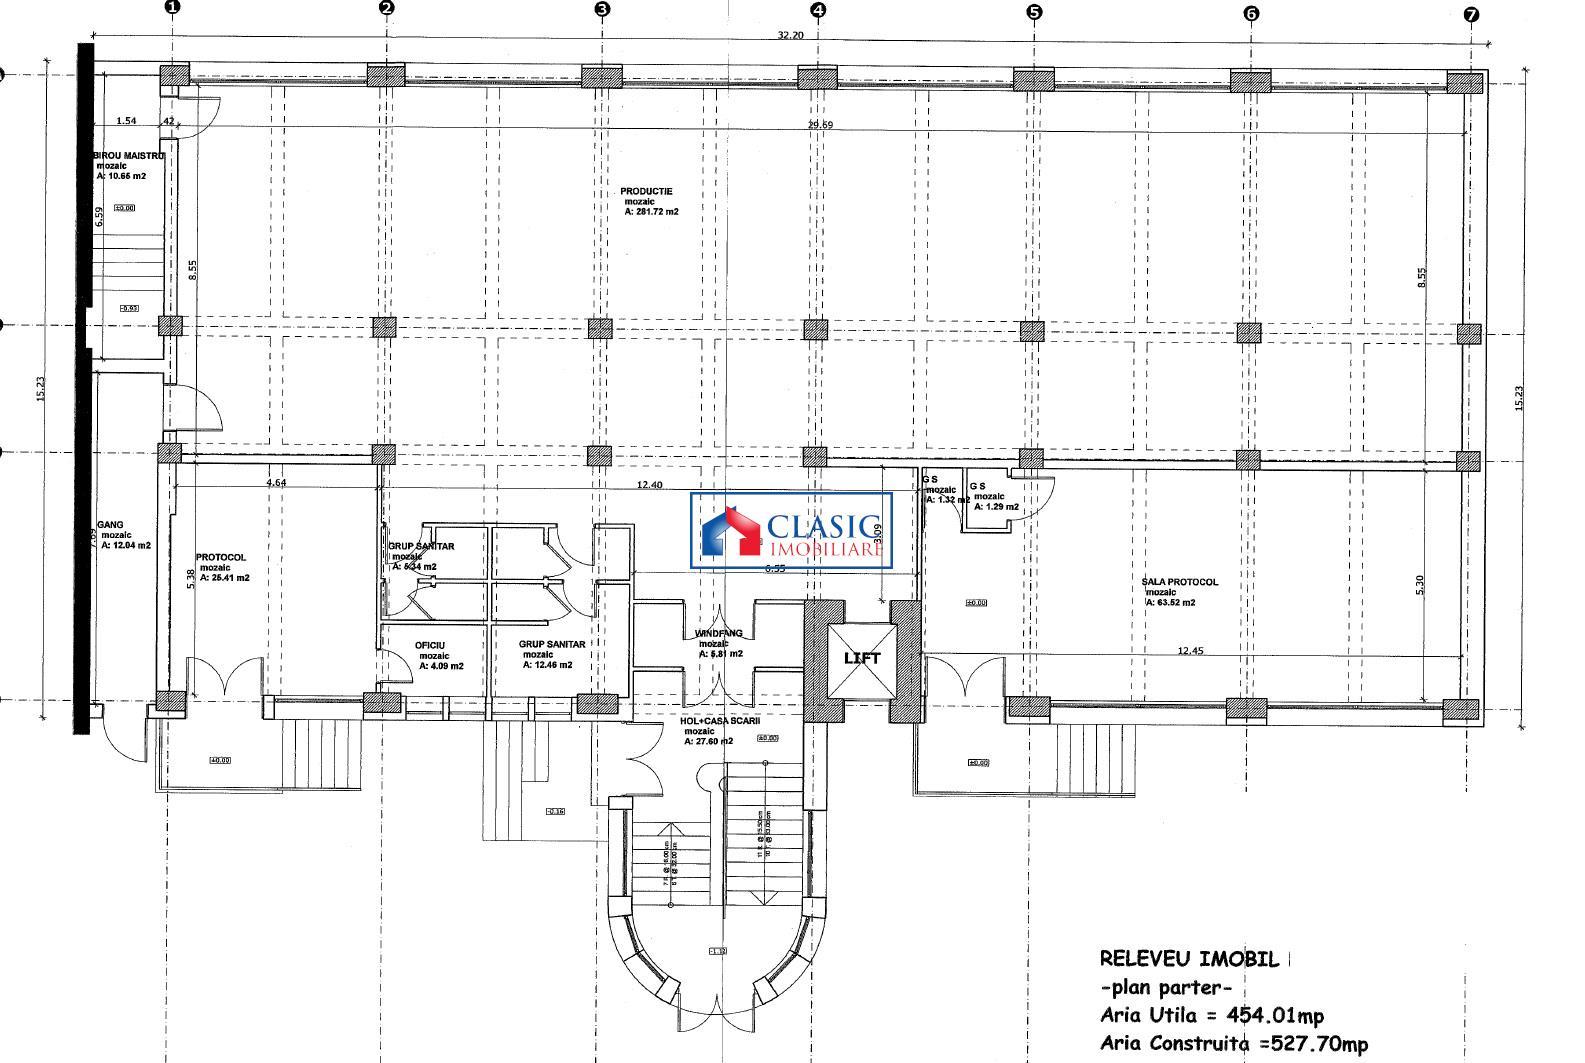 Vanzare cladire 1700 mp, comercial sau birouri, Marasti, Cluj Napoca